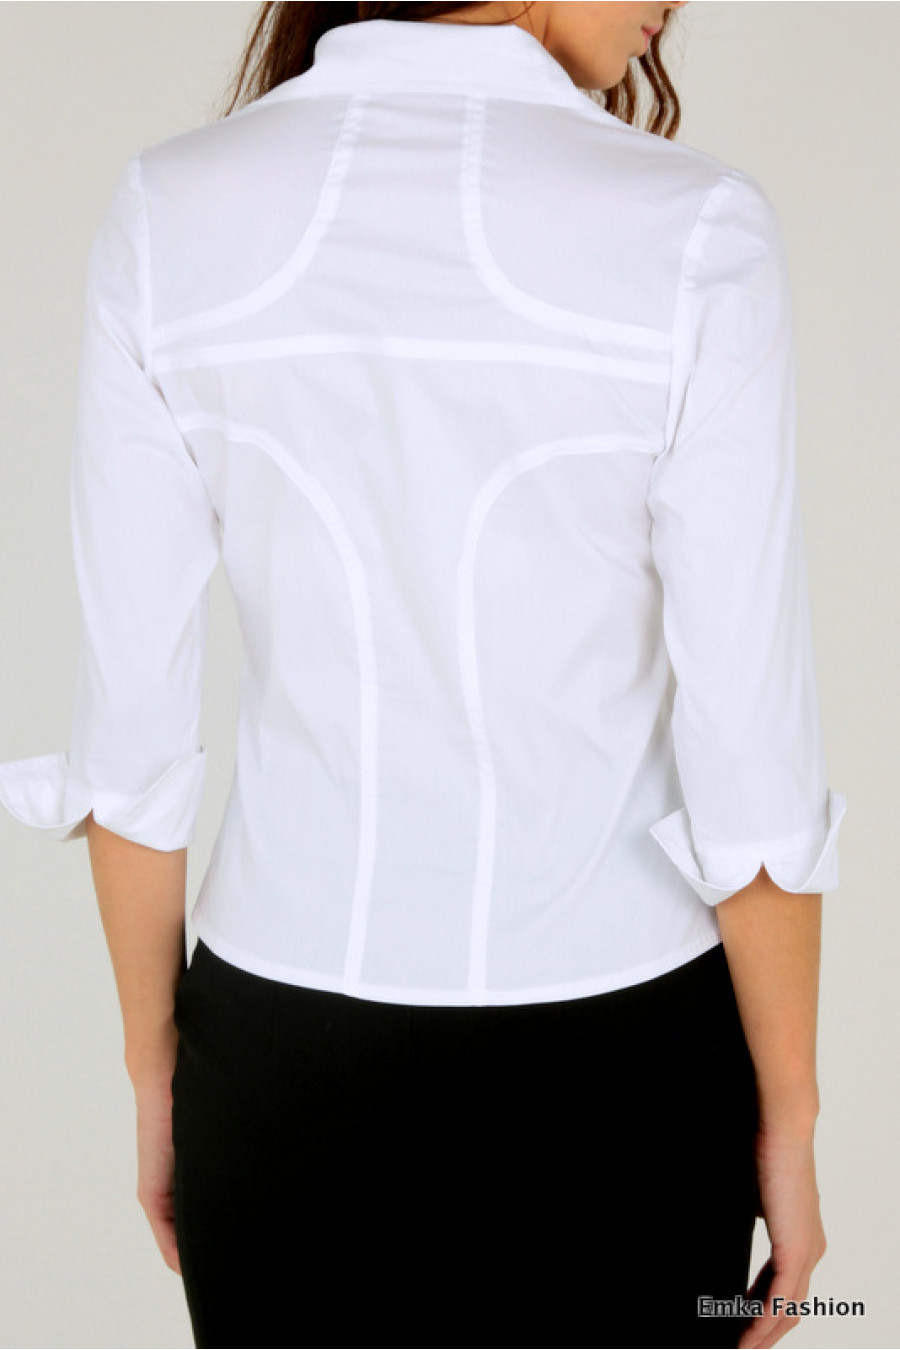 Купить Дешево Белую Блузку